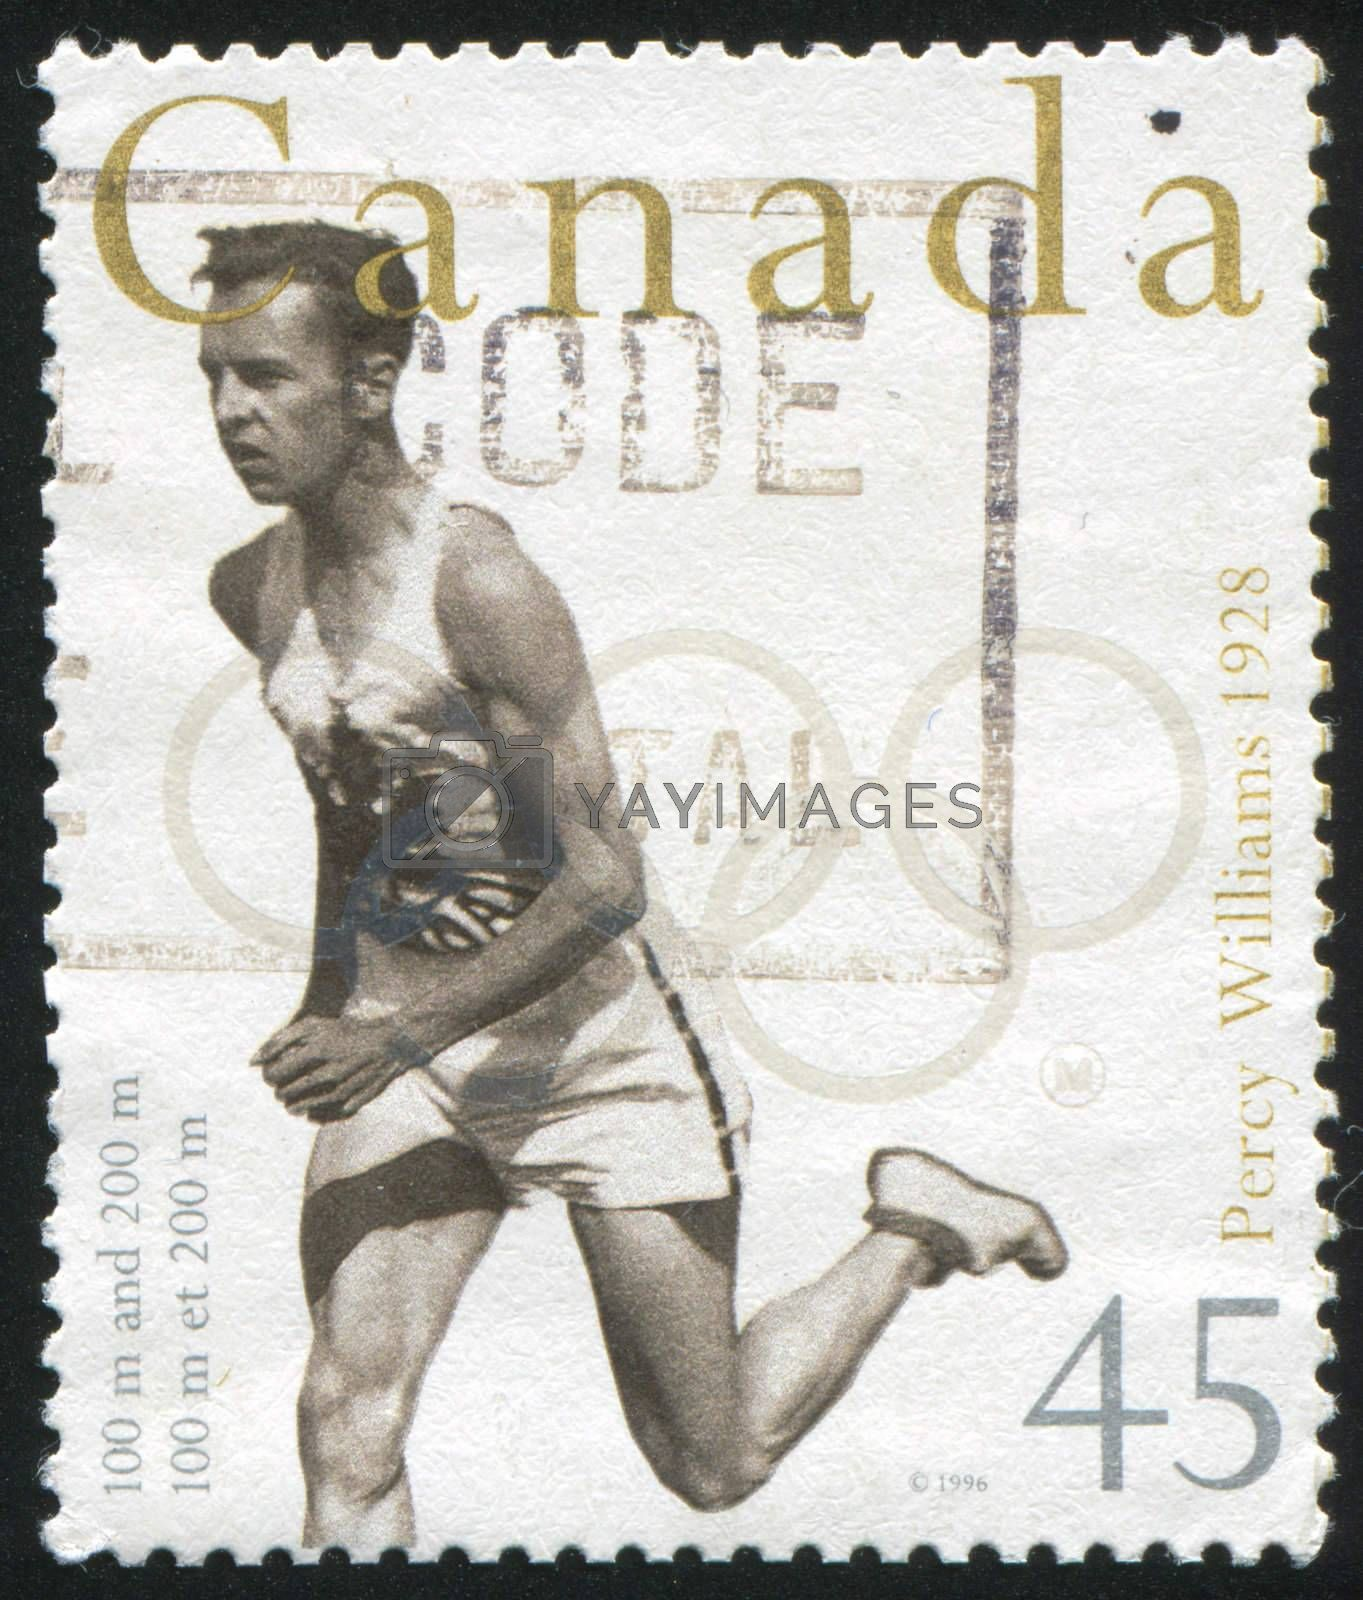 CANADA - CIRCA 1996: stamp printed by Canada, shows Percy Williams, circa 1996